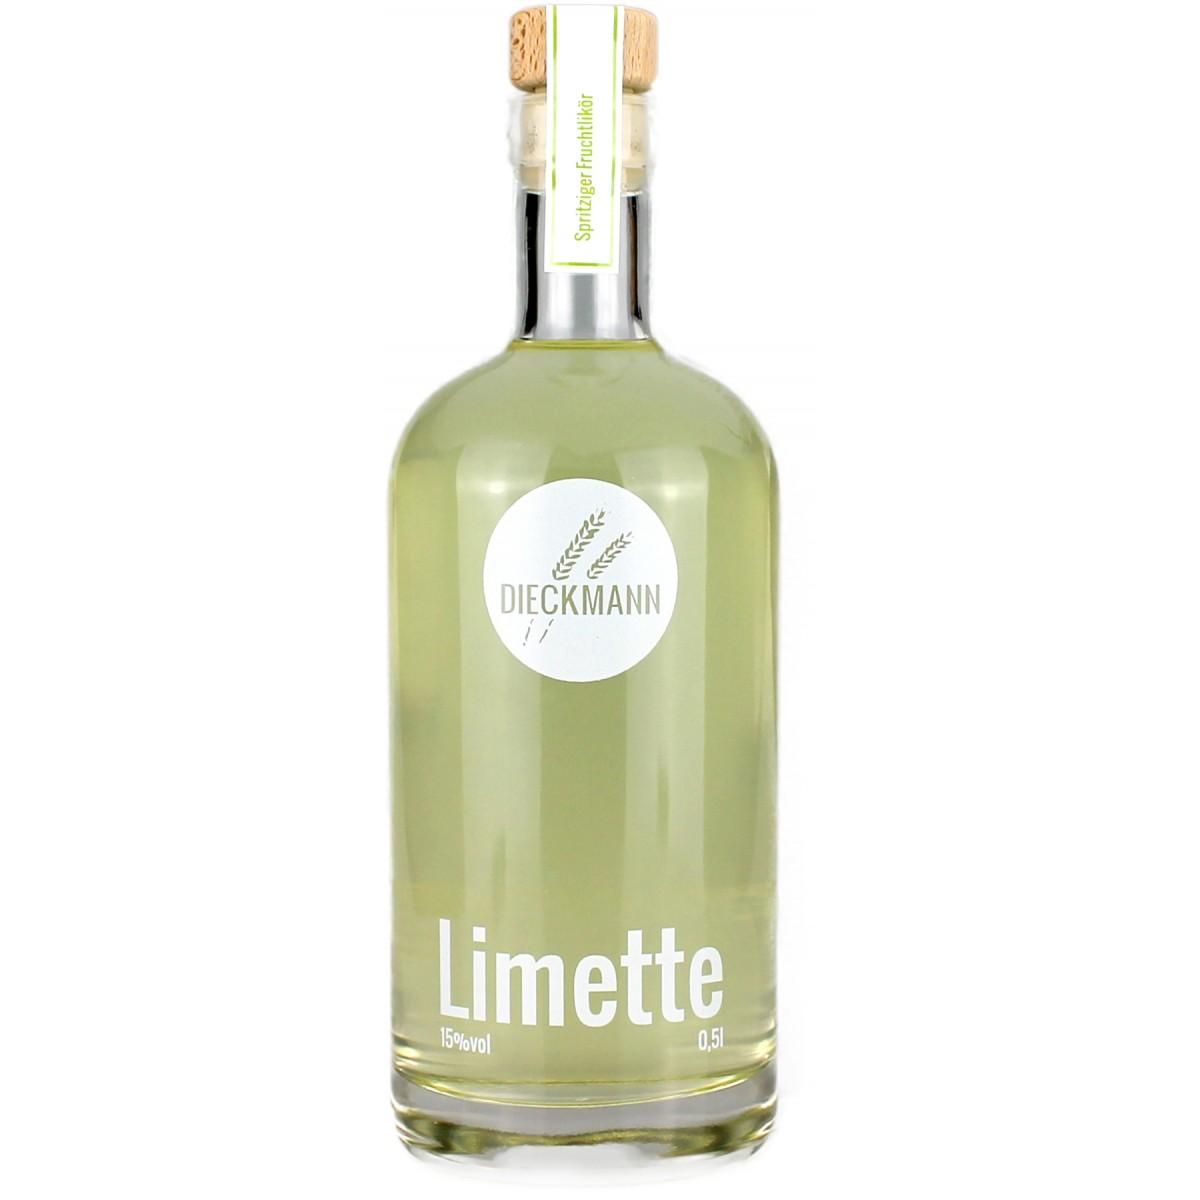 Weizenbrennerei & Likörmanufaktur Dieckmann Limette - Fruchtlikör LIKÖR 15%vol., 0,5l